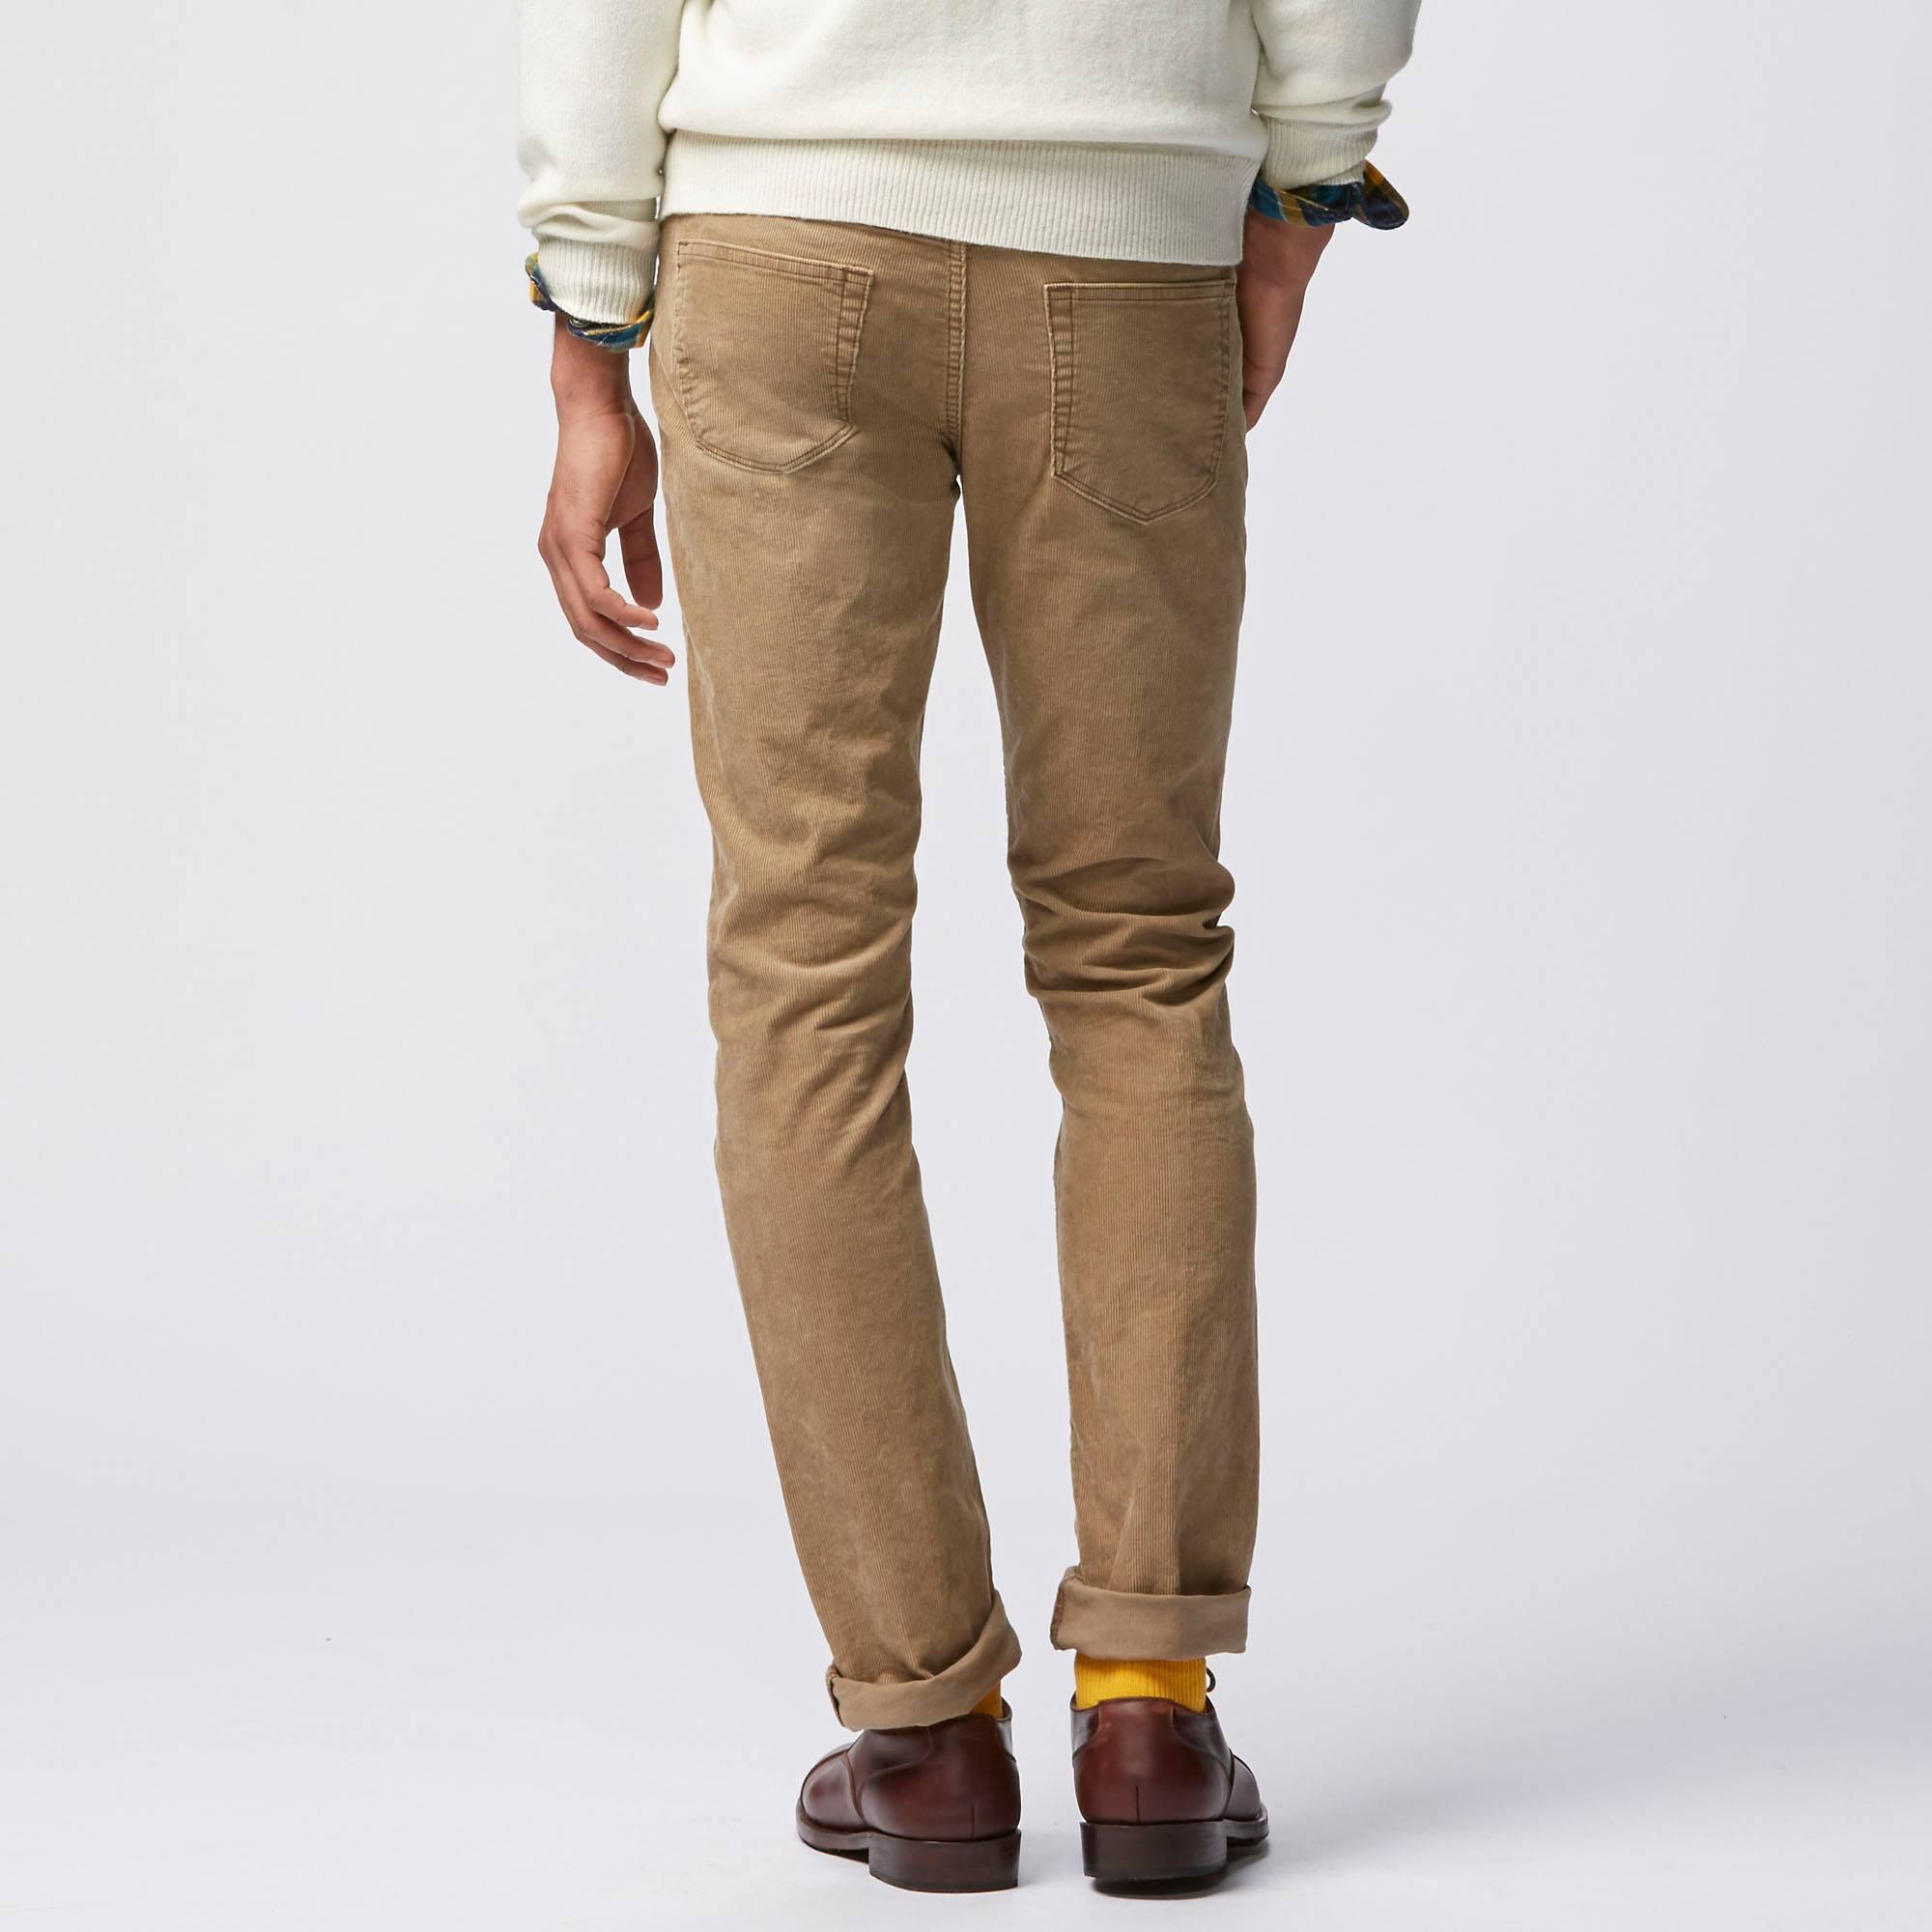 Mens Slim Corduroy Pants